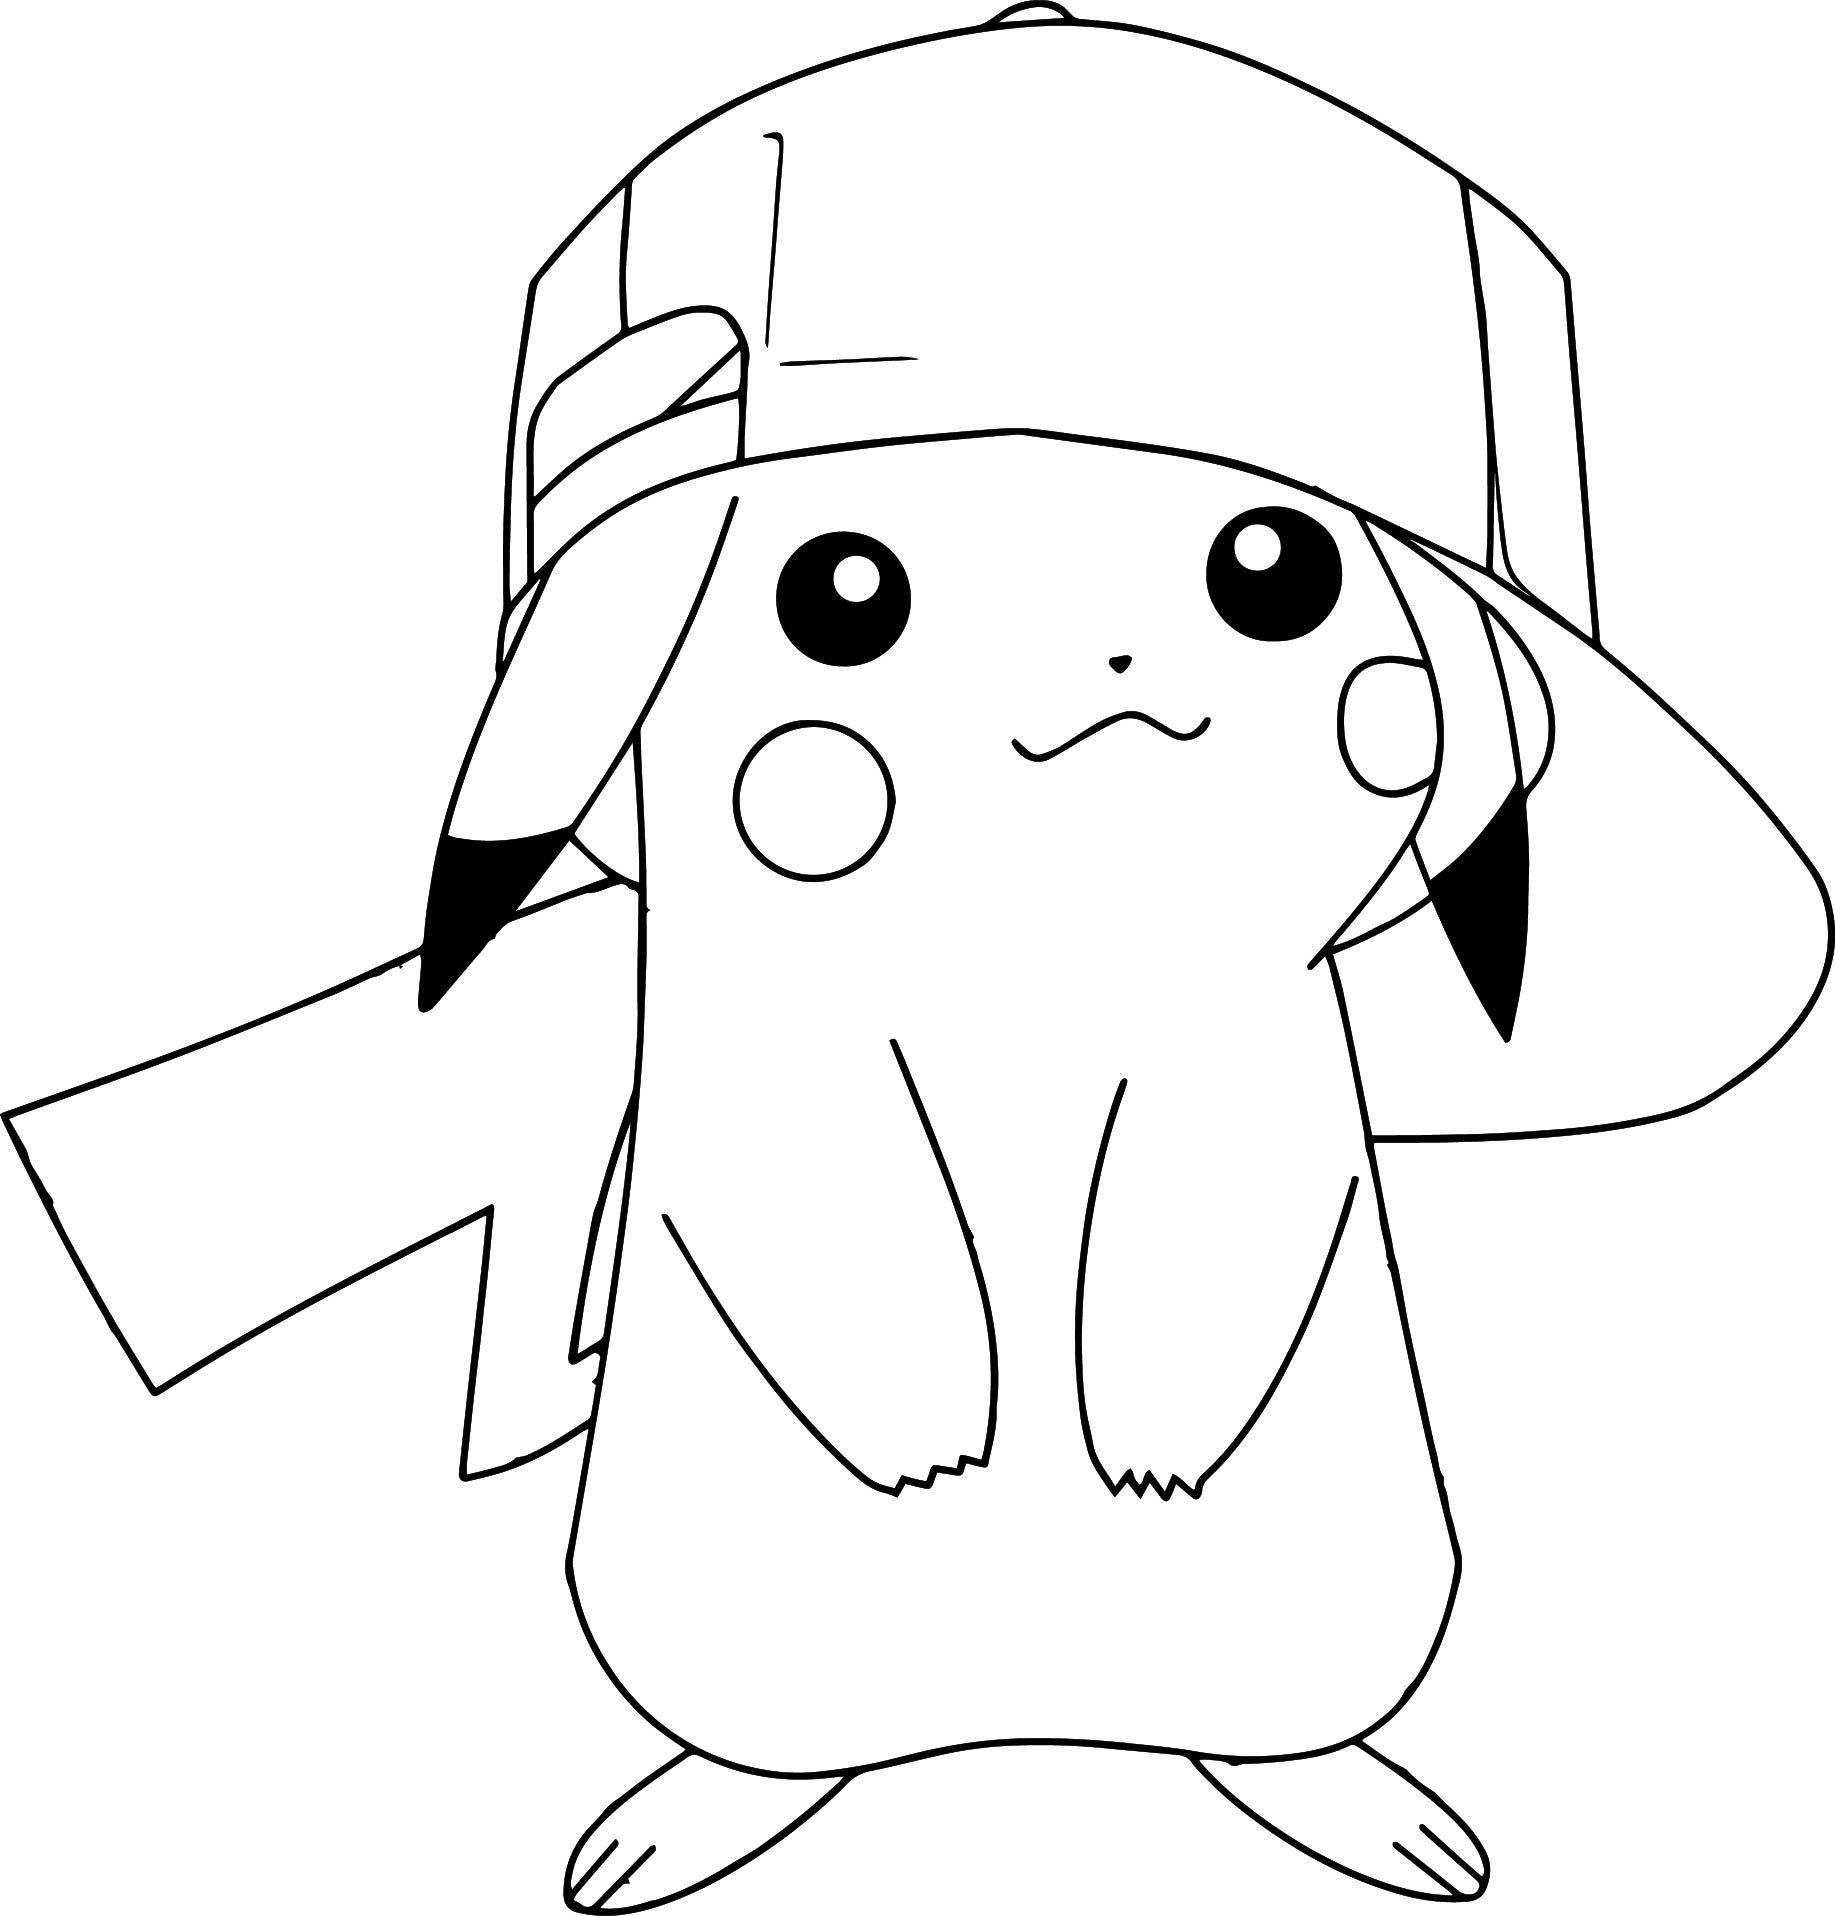 pikachu-pokemon-coloring-page - Wecoloringpage  Cartoon coloring